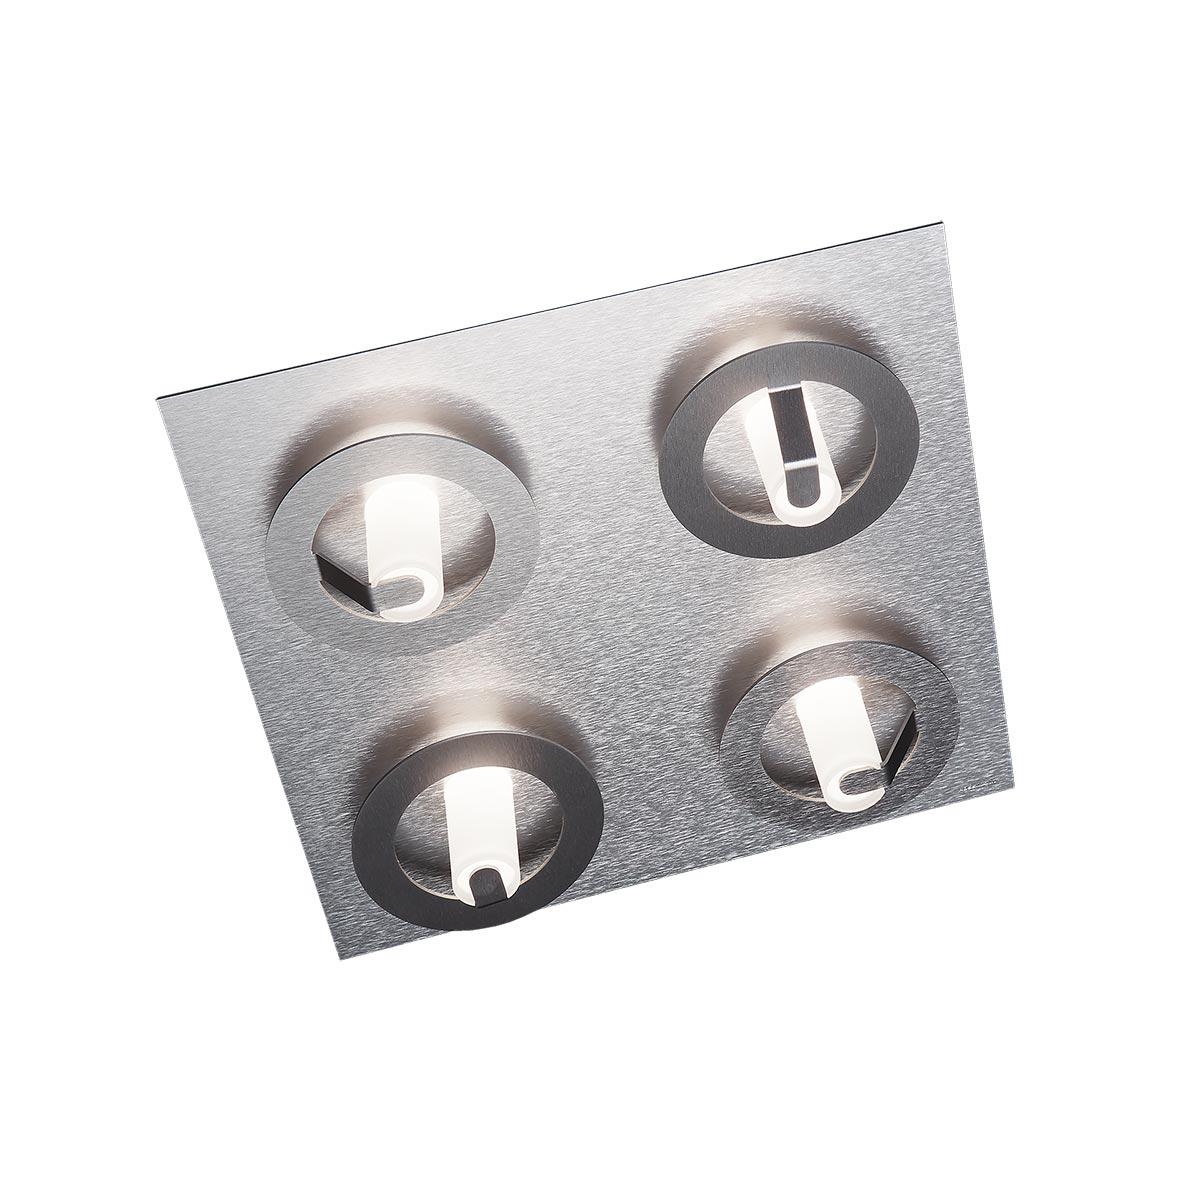 Grossmann Q LED Deckenleuchte, 4-flg., quadratisch 75-818-072